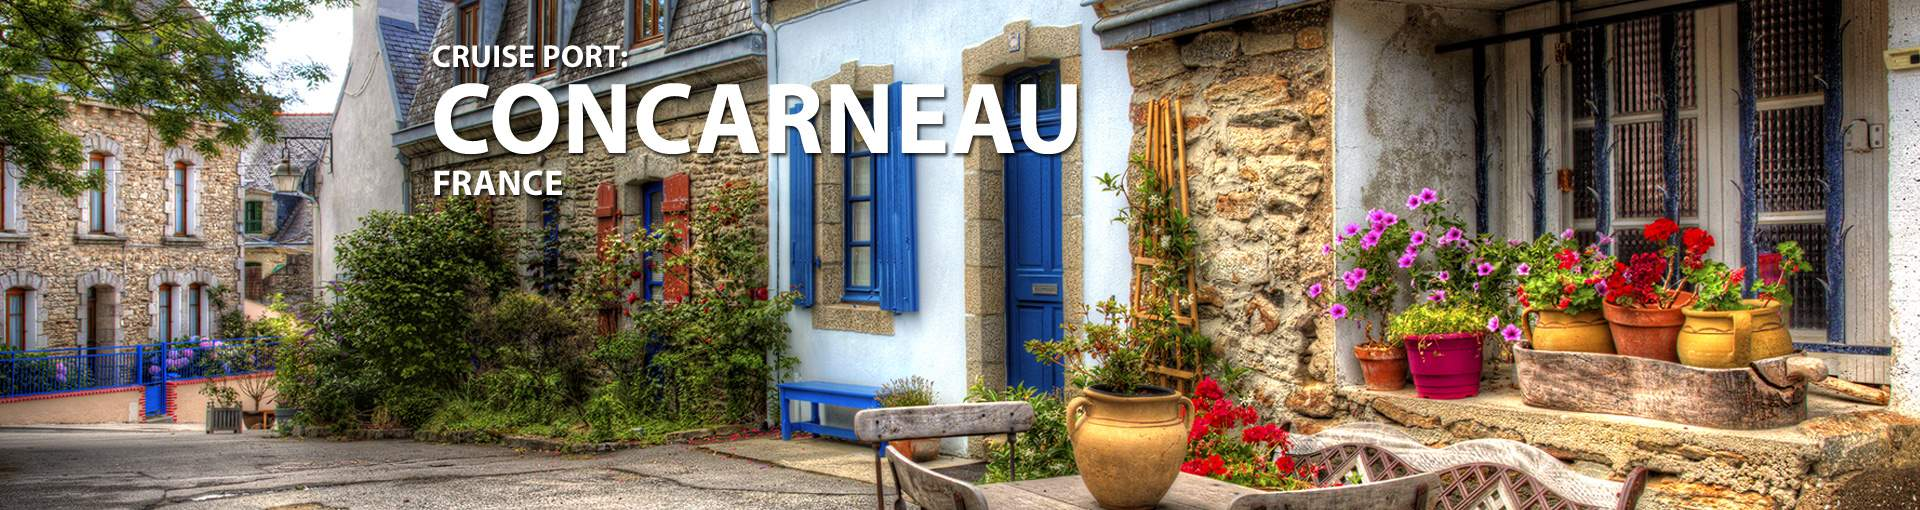 Cruises to Concarneau, France